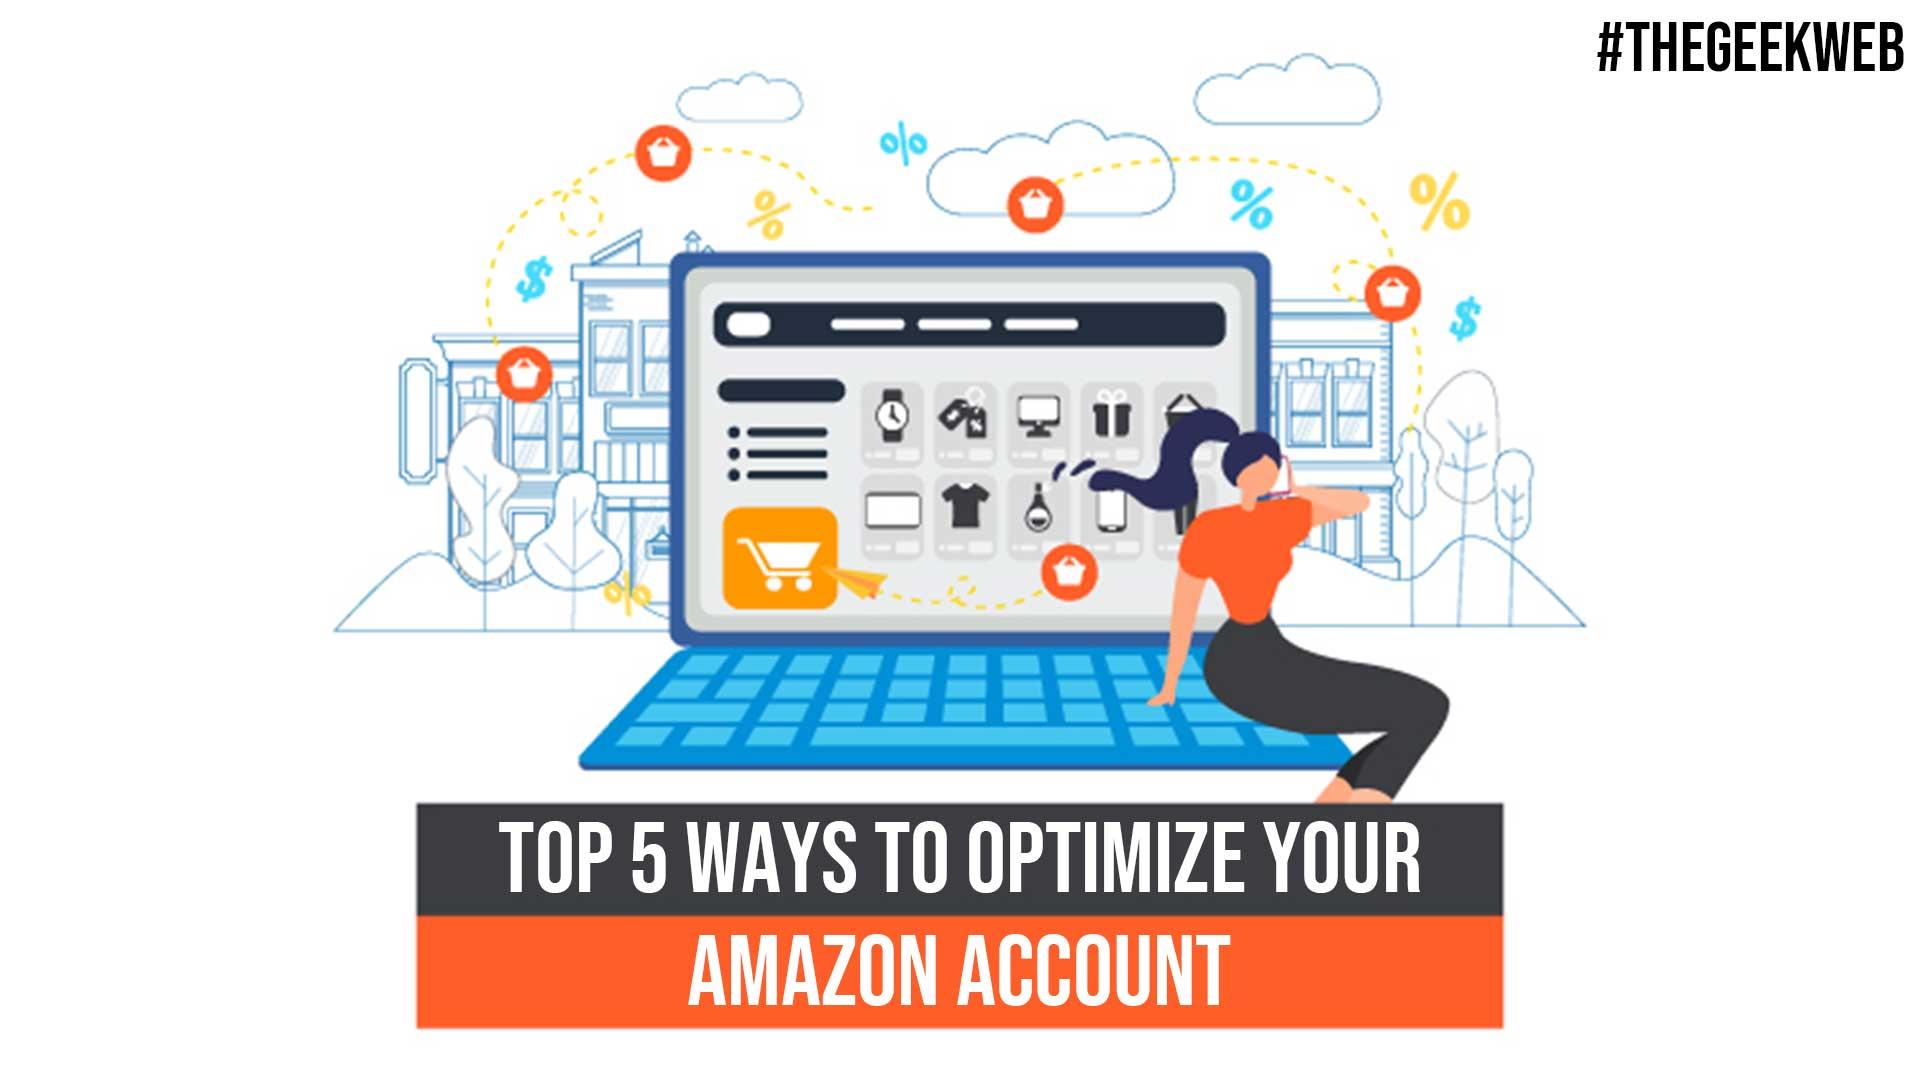 Top 5 Ways to Optimize Your Amazon Account